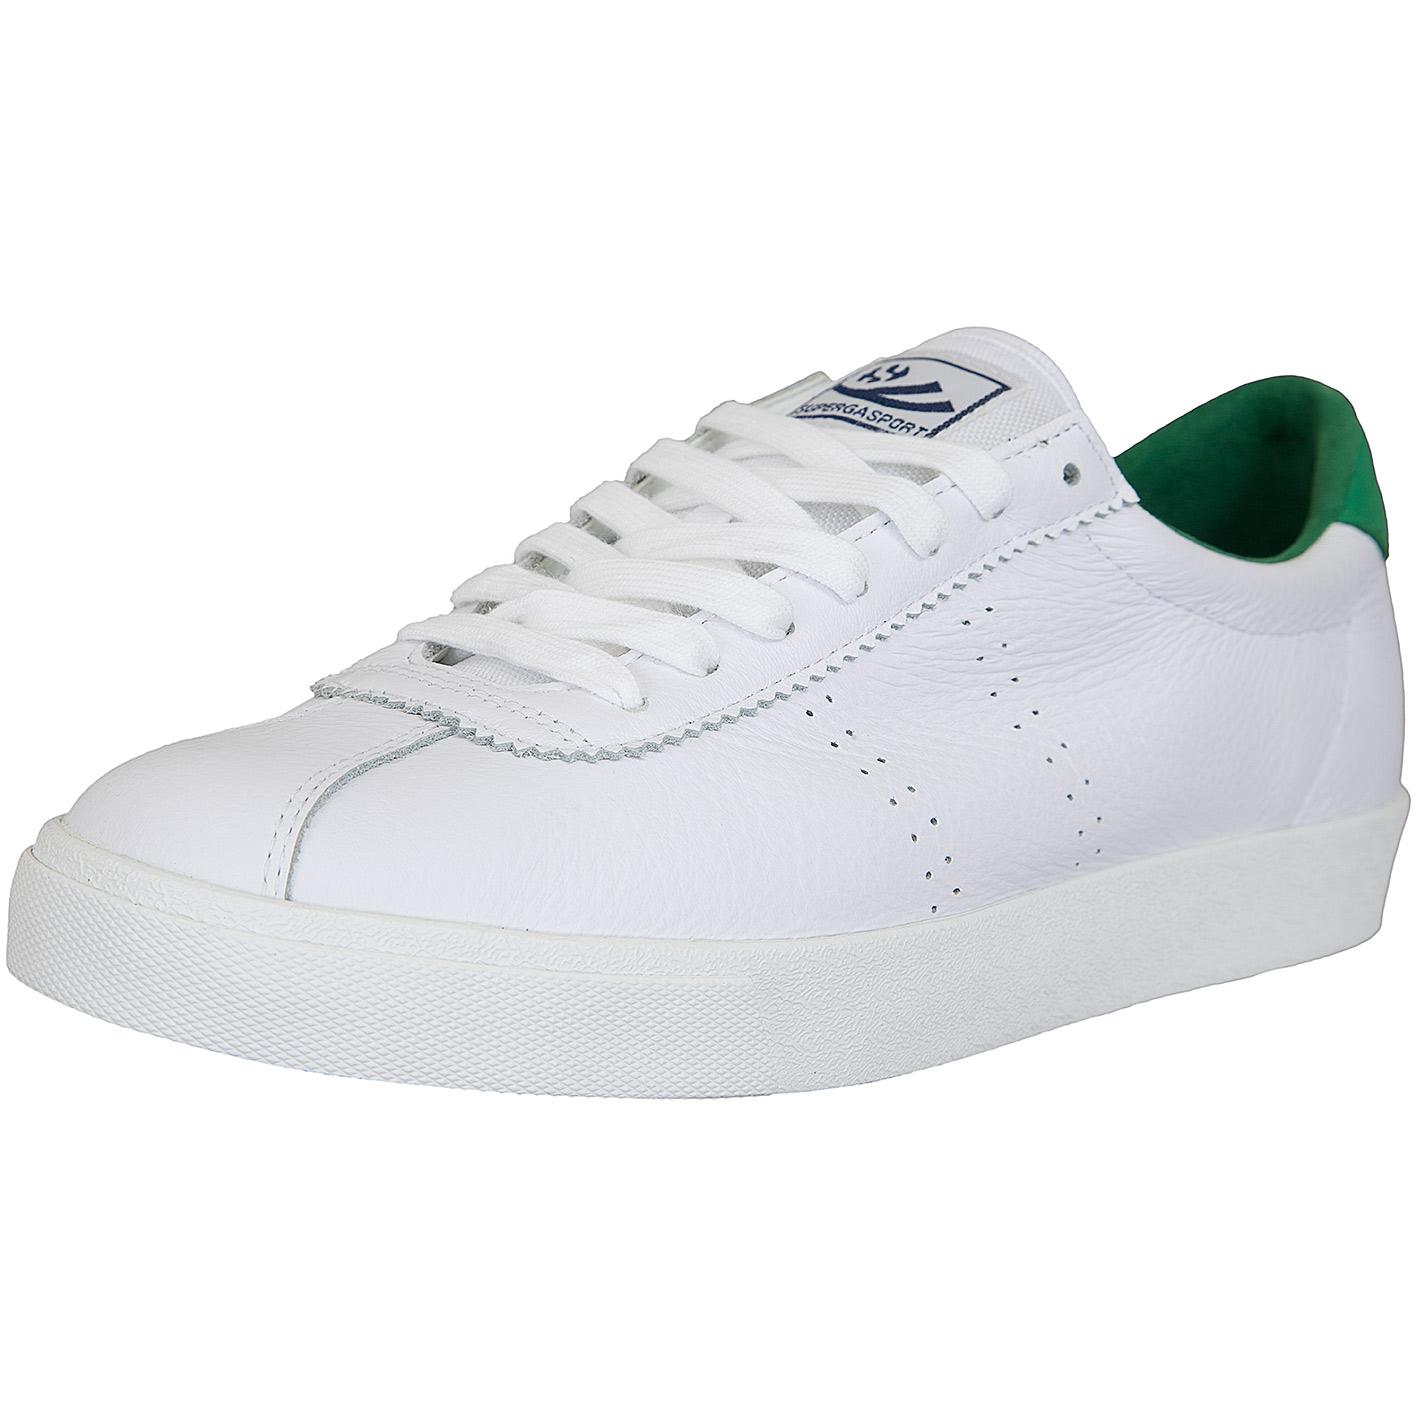 neueste trends das beste Luxus-Ästhetik Superga Sneaker Comfleau weiß/grün